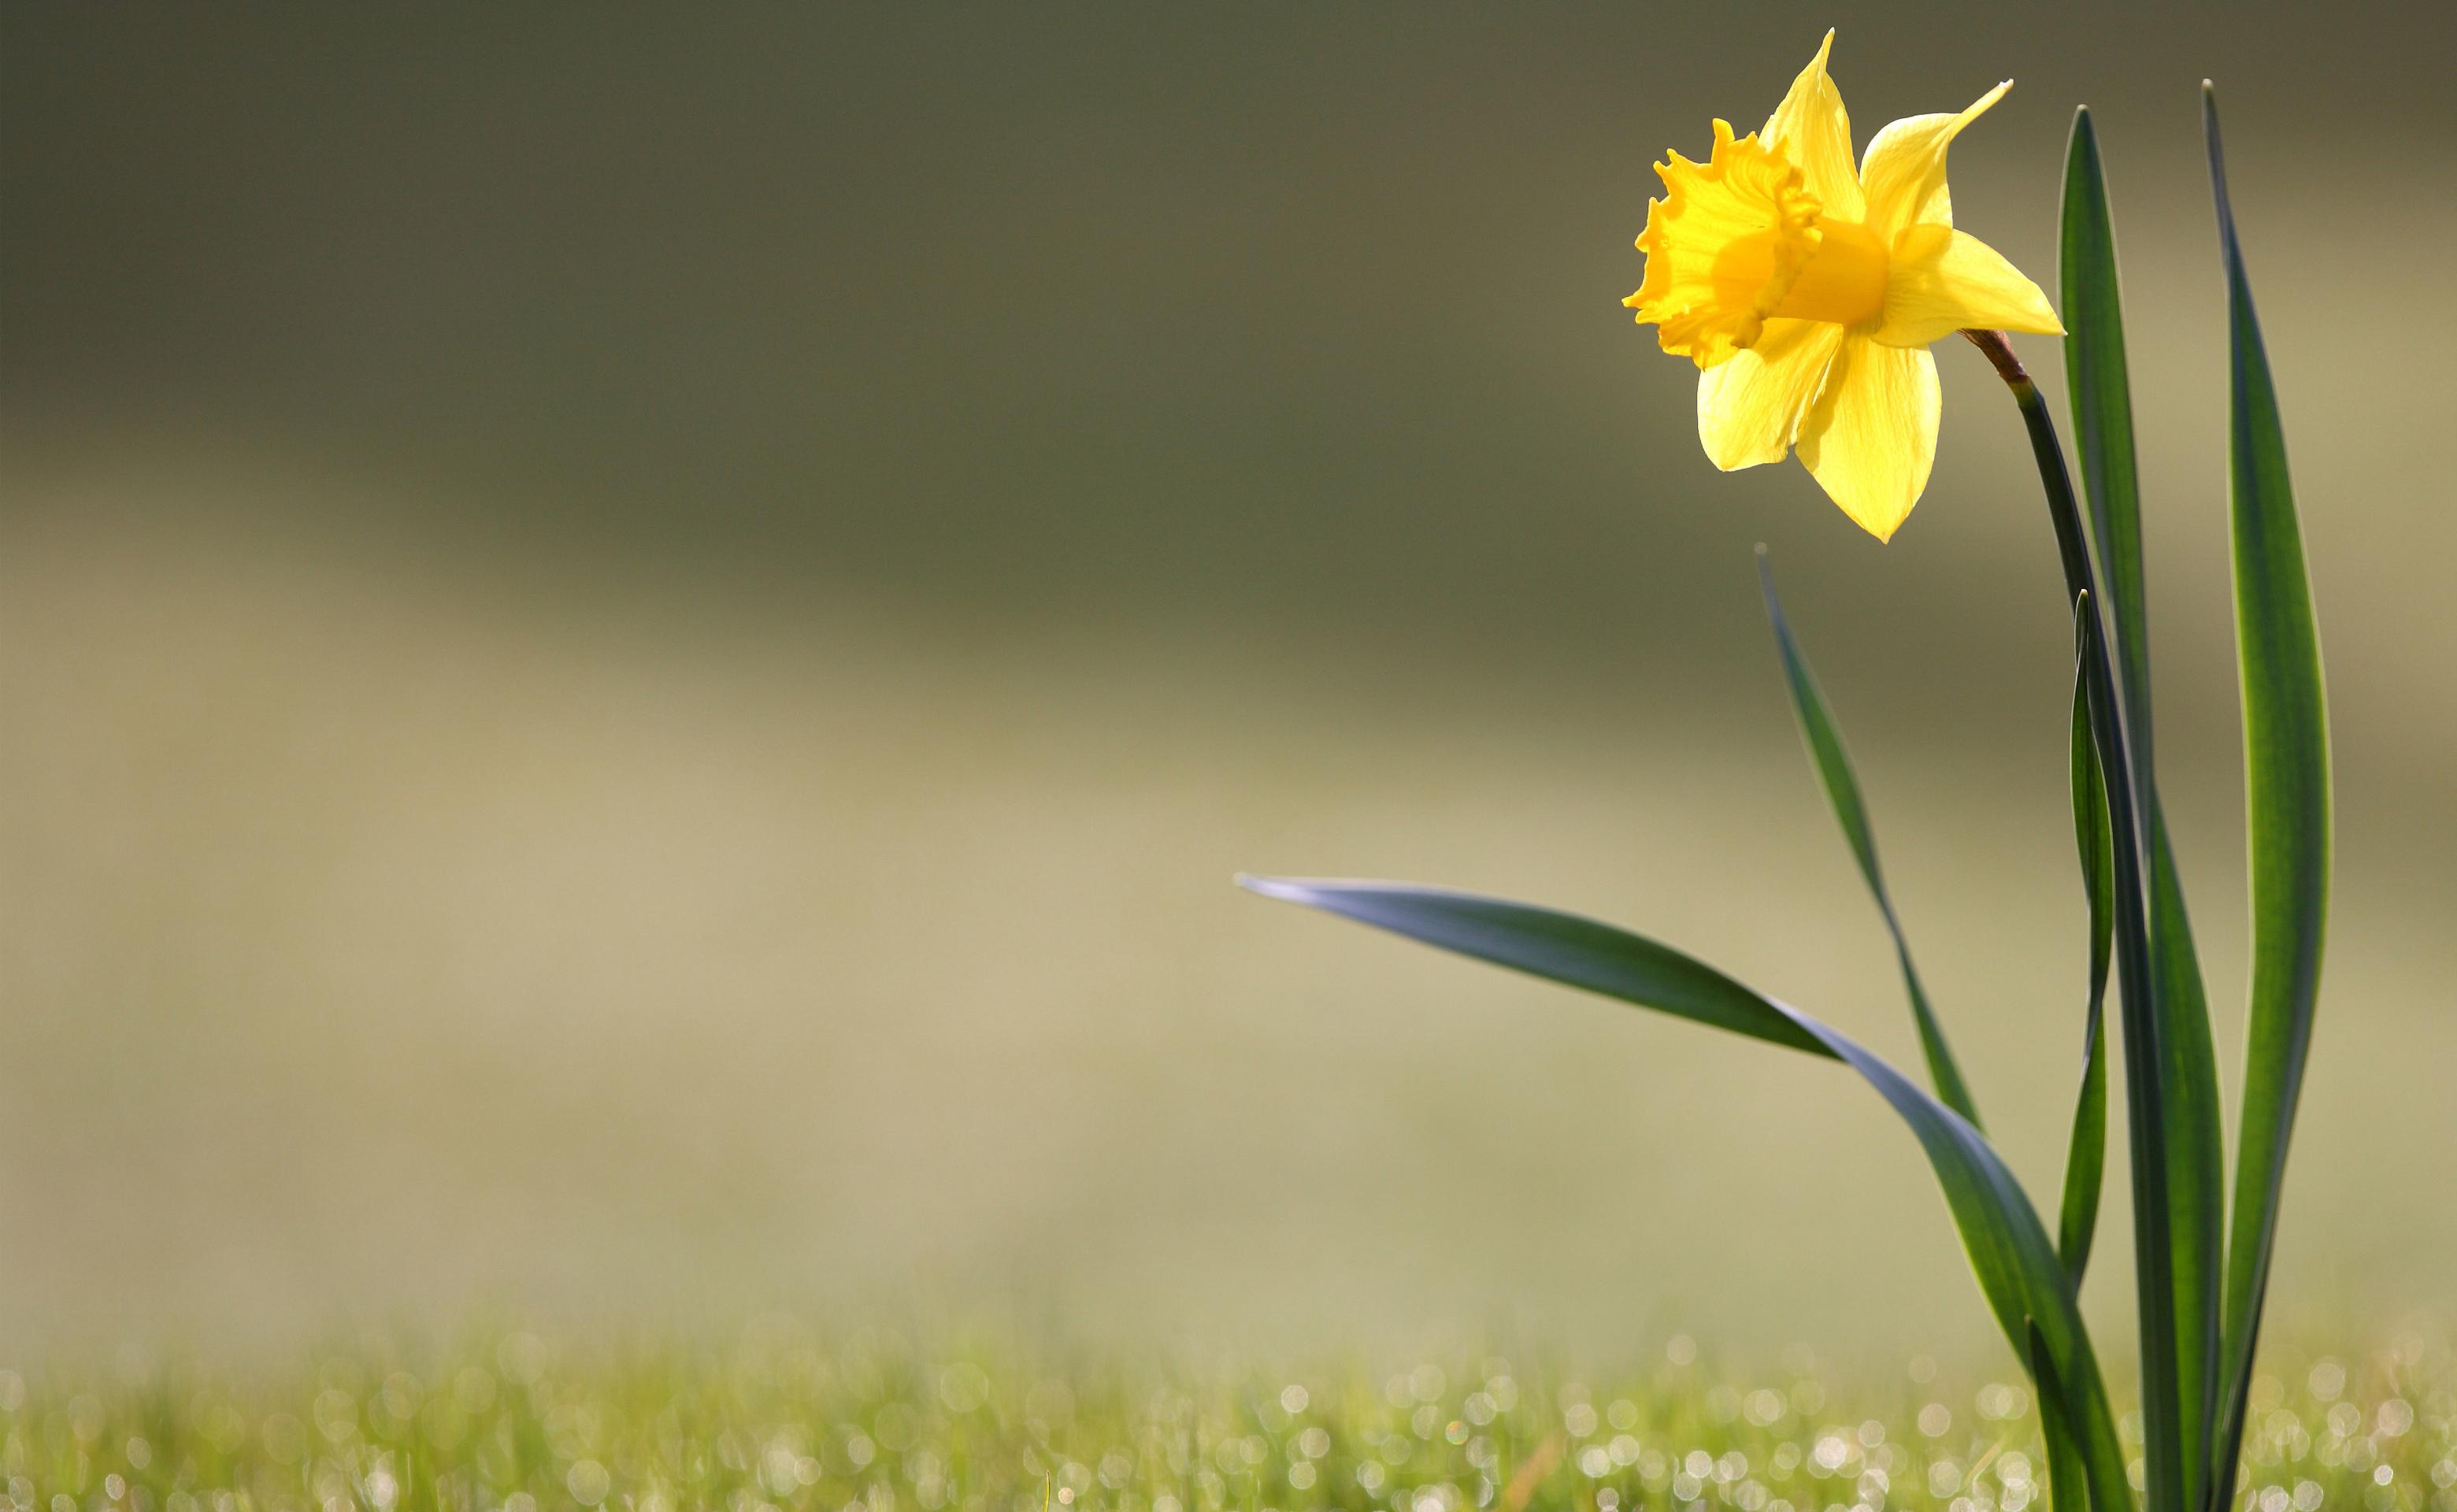 HD Daffodil Wallpapers Download   783383 3120x1920